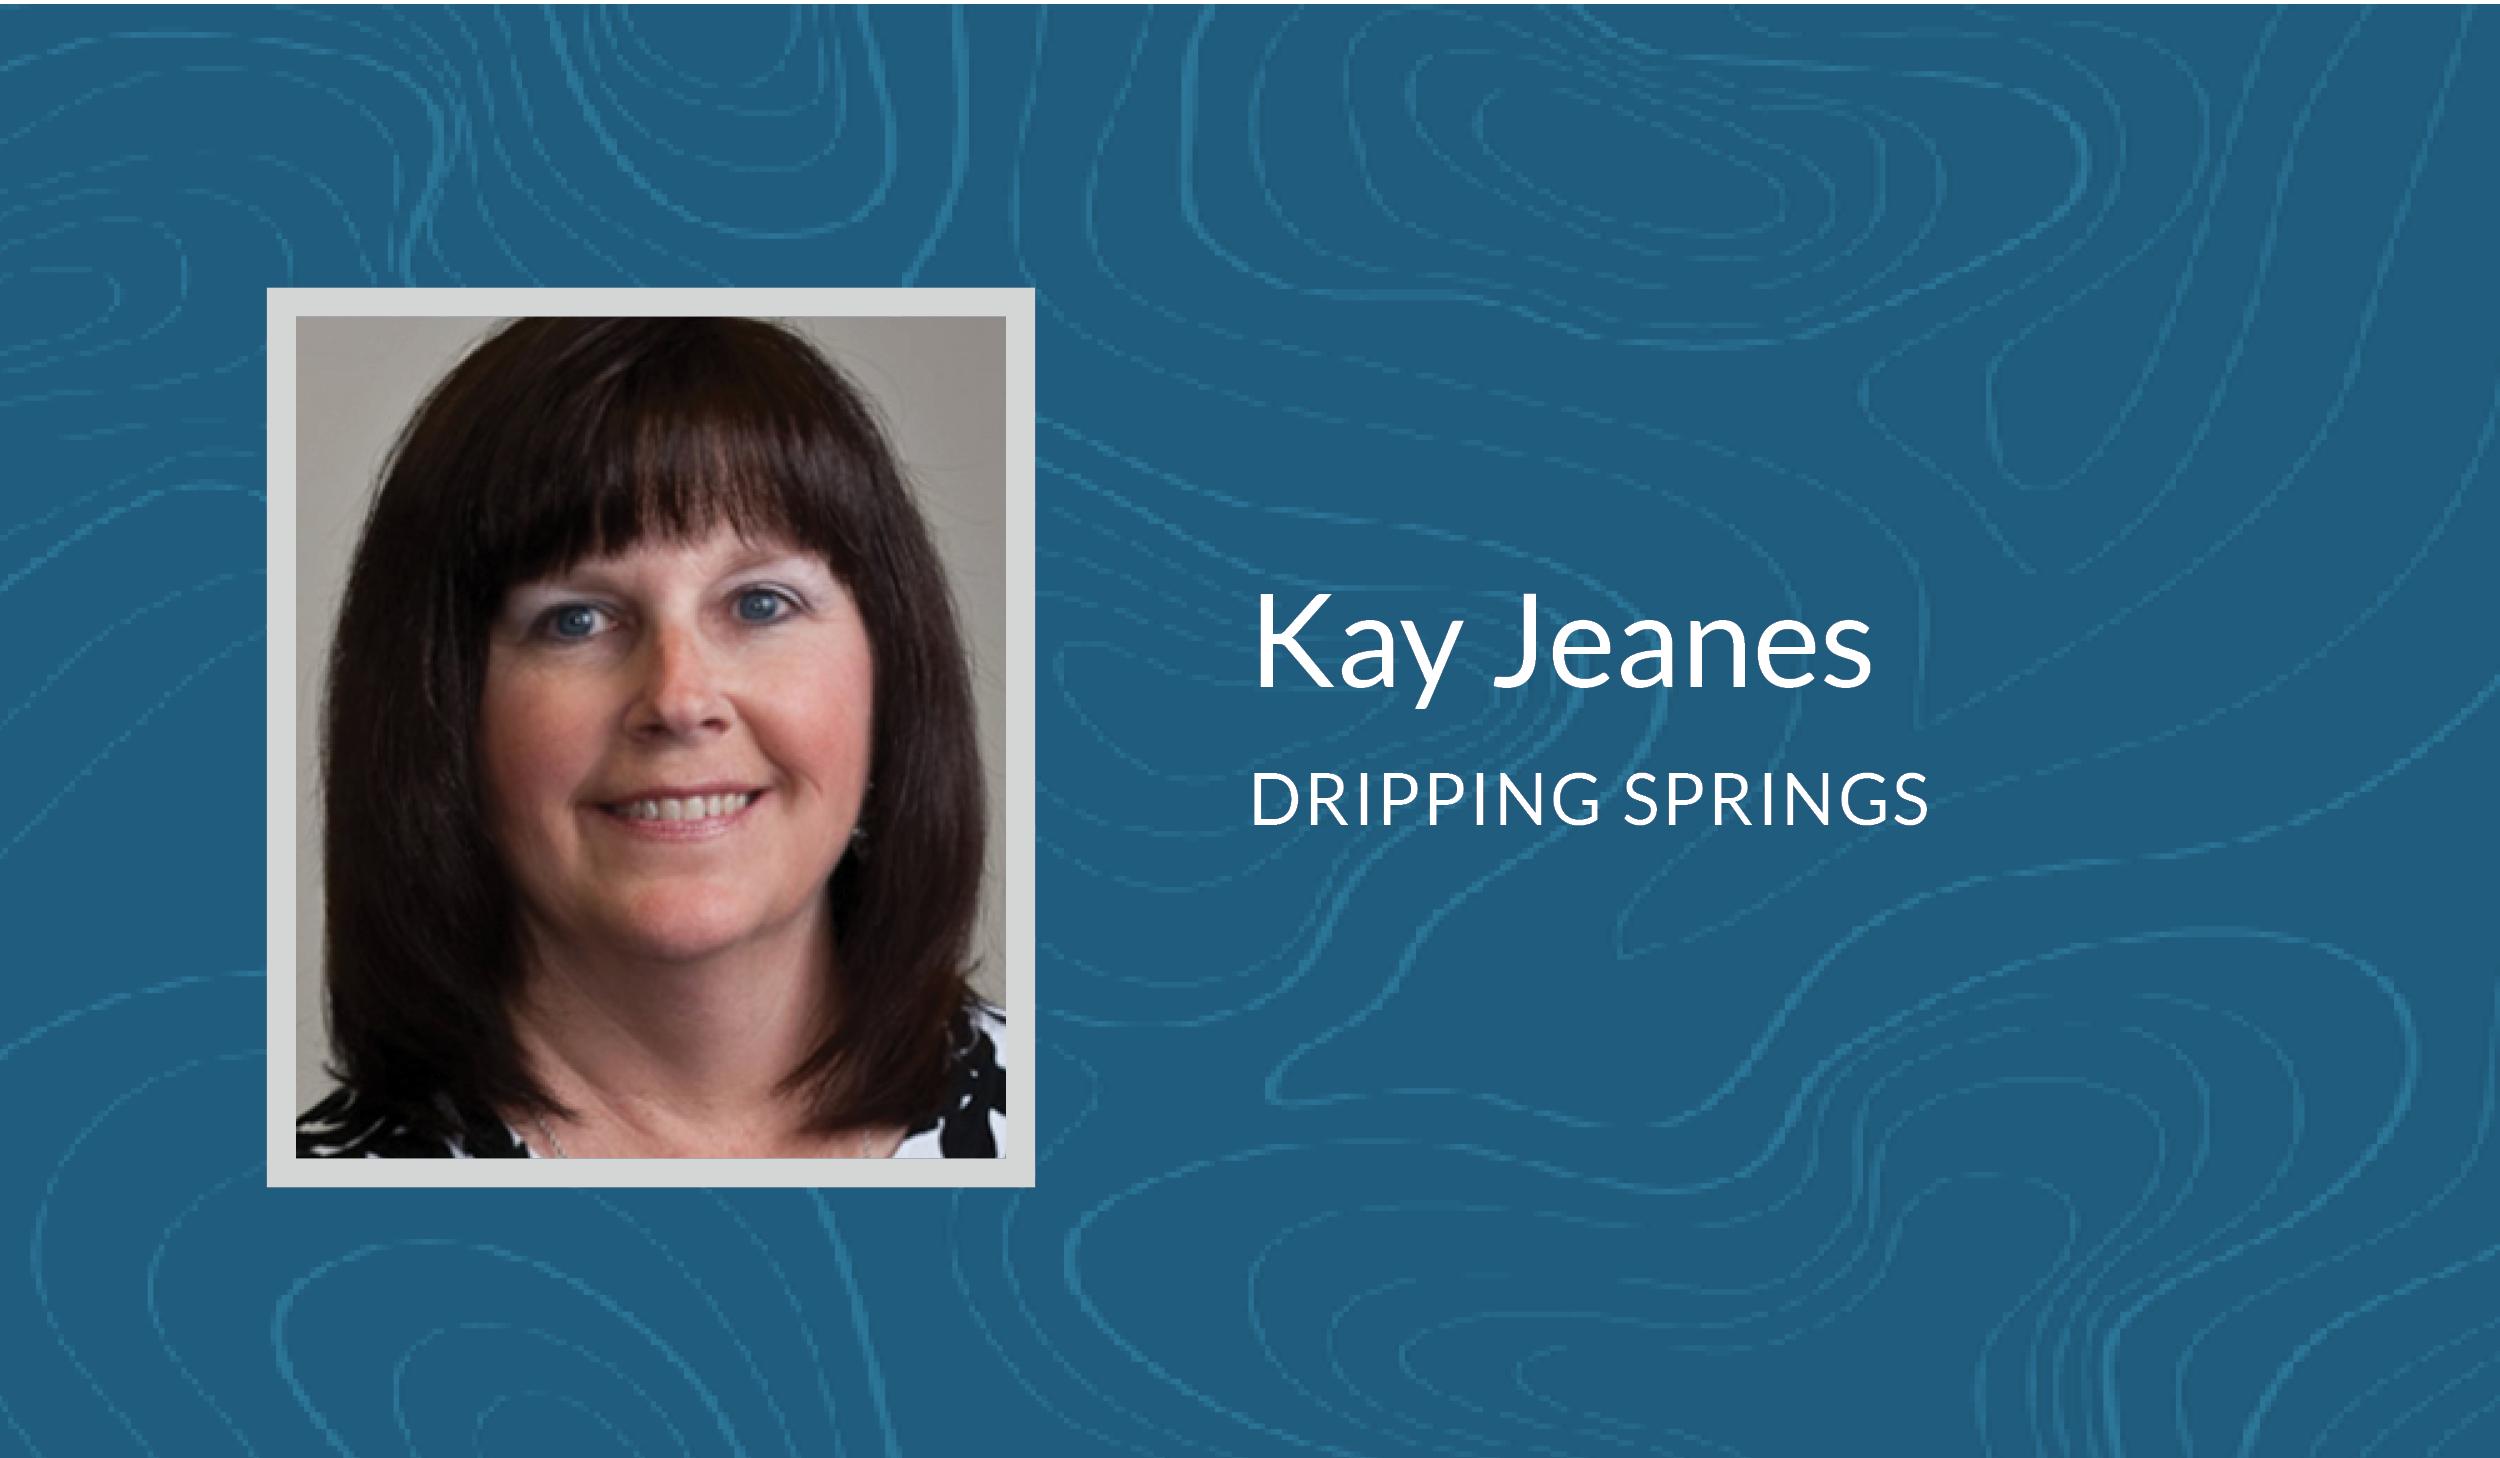 Kay Jeanes Landing Page Headers.png